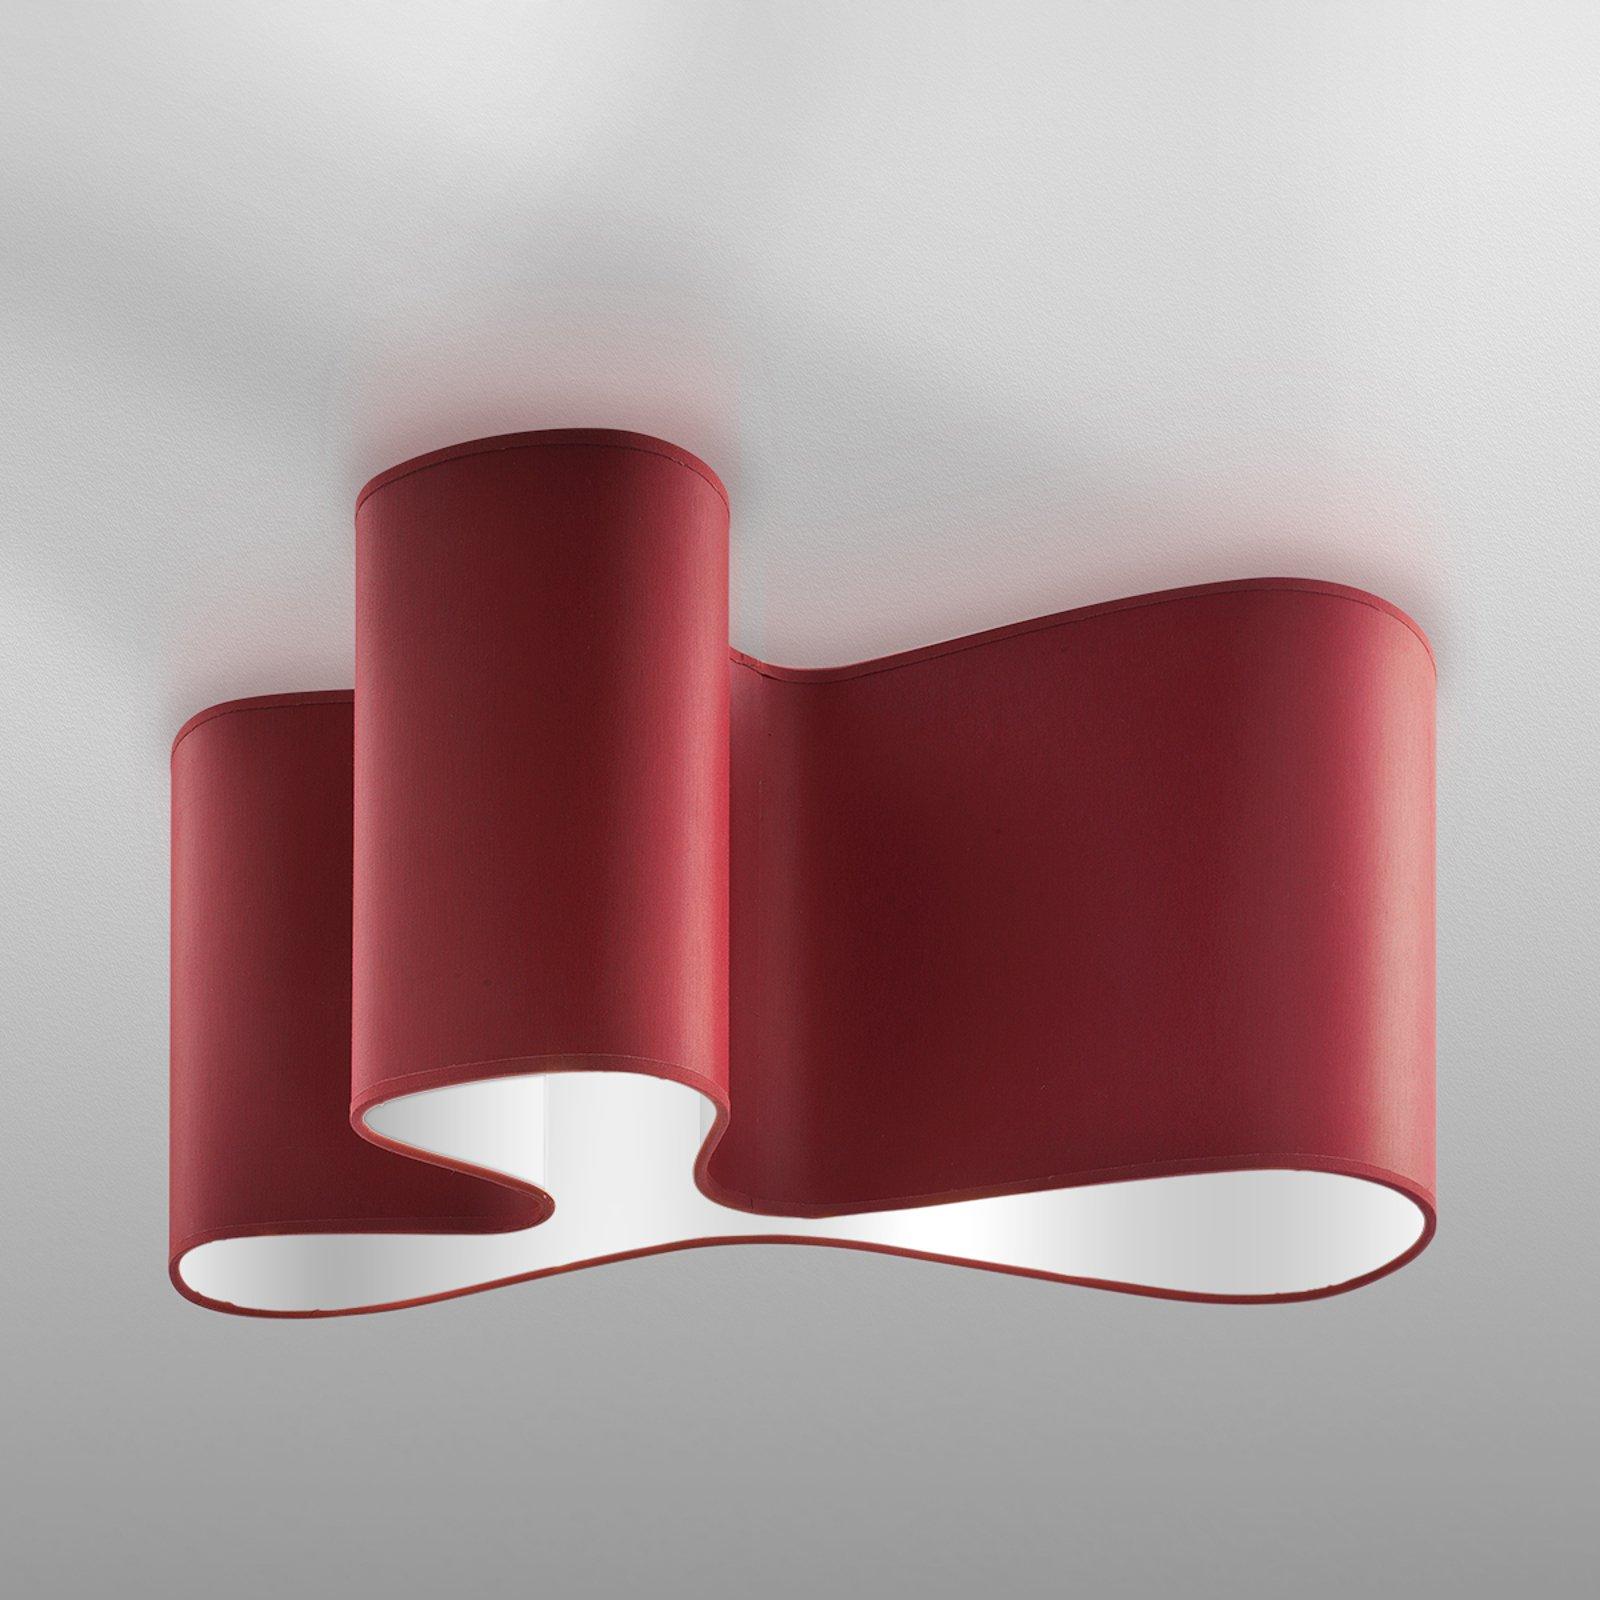 Attraktiv designtaklampe Mugello, rød/hvit